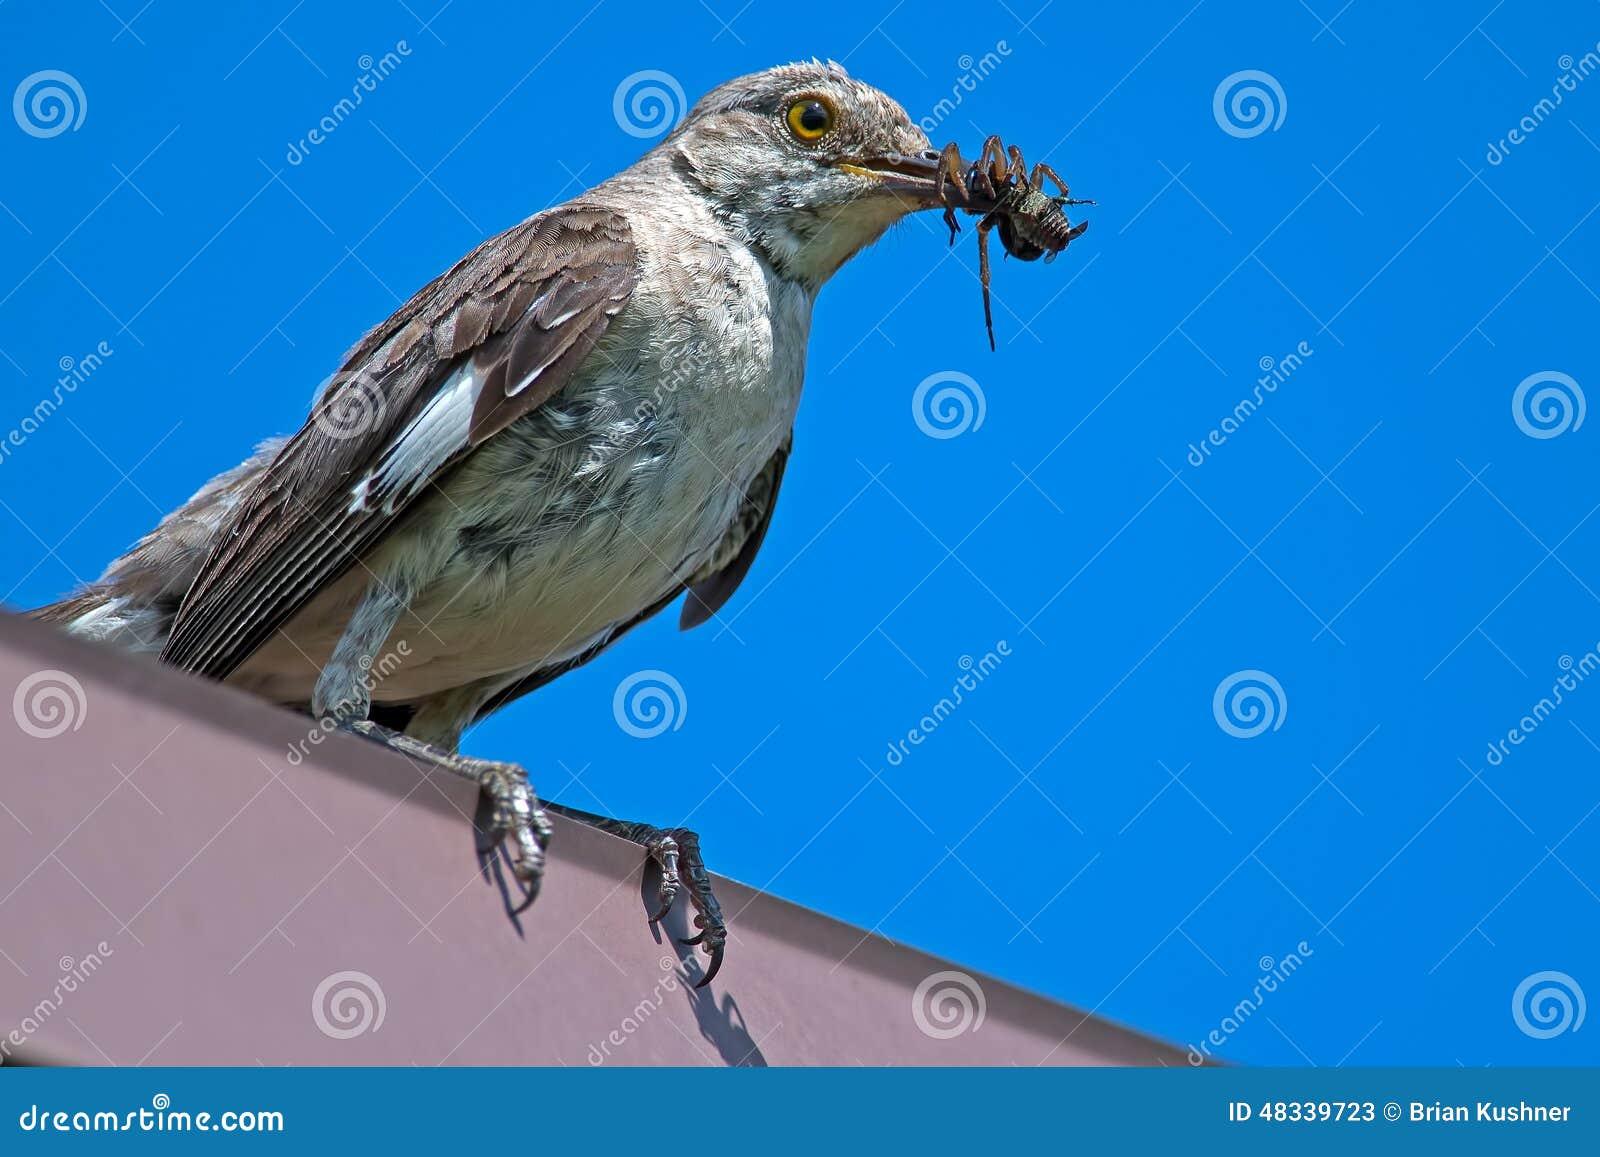 northern mockingbird - Mocking Bird Download